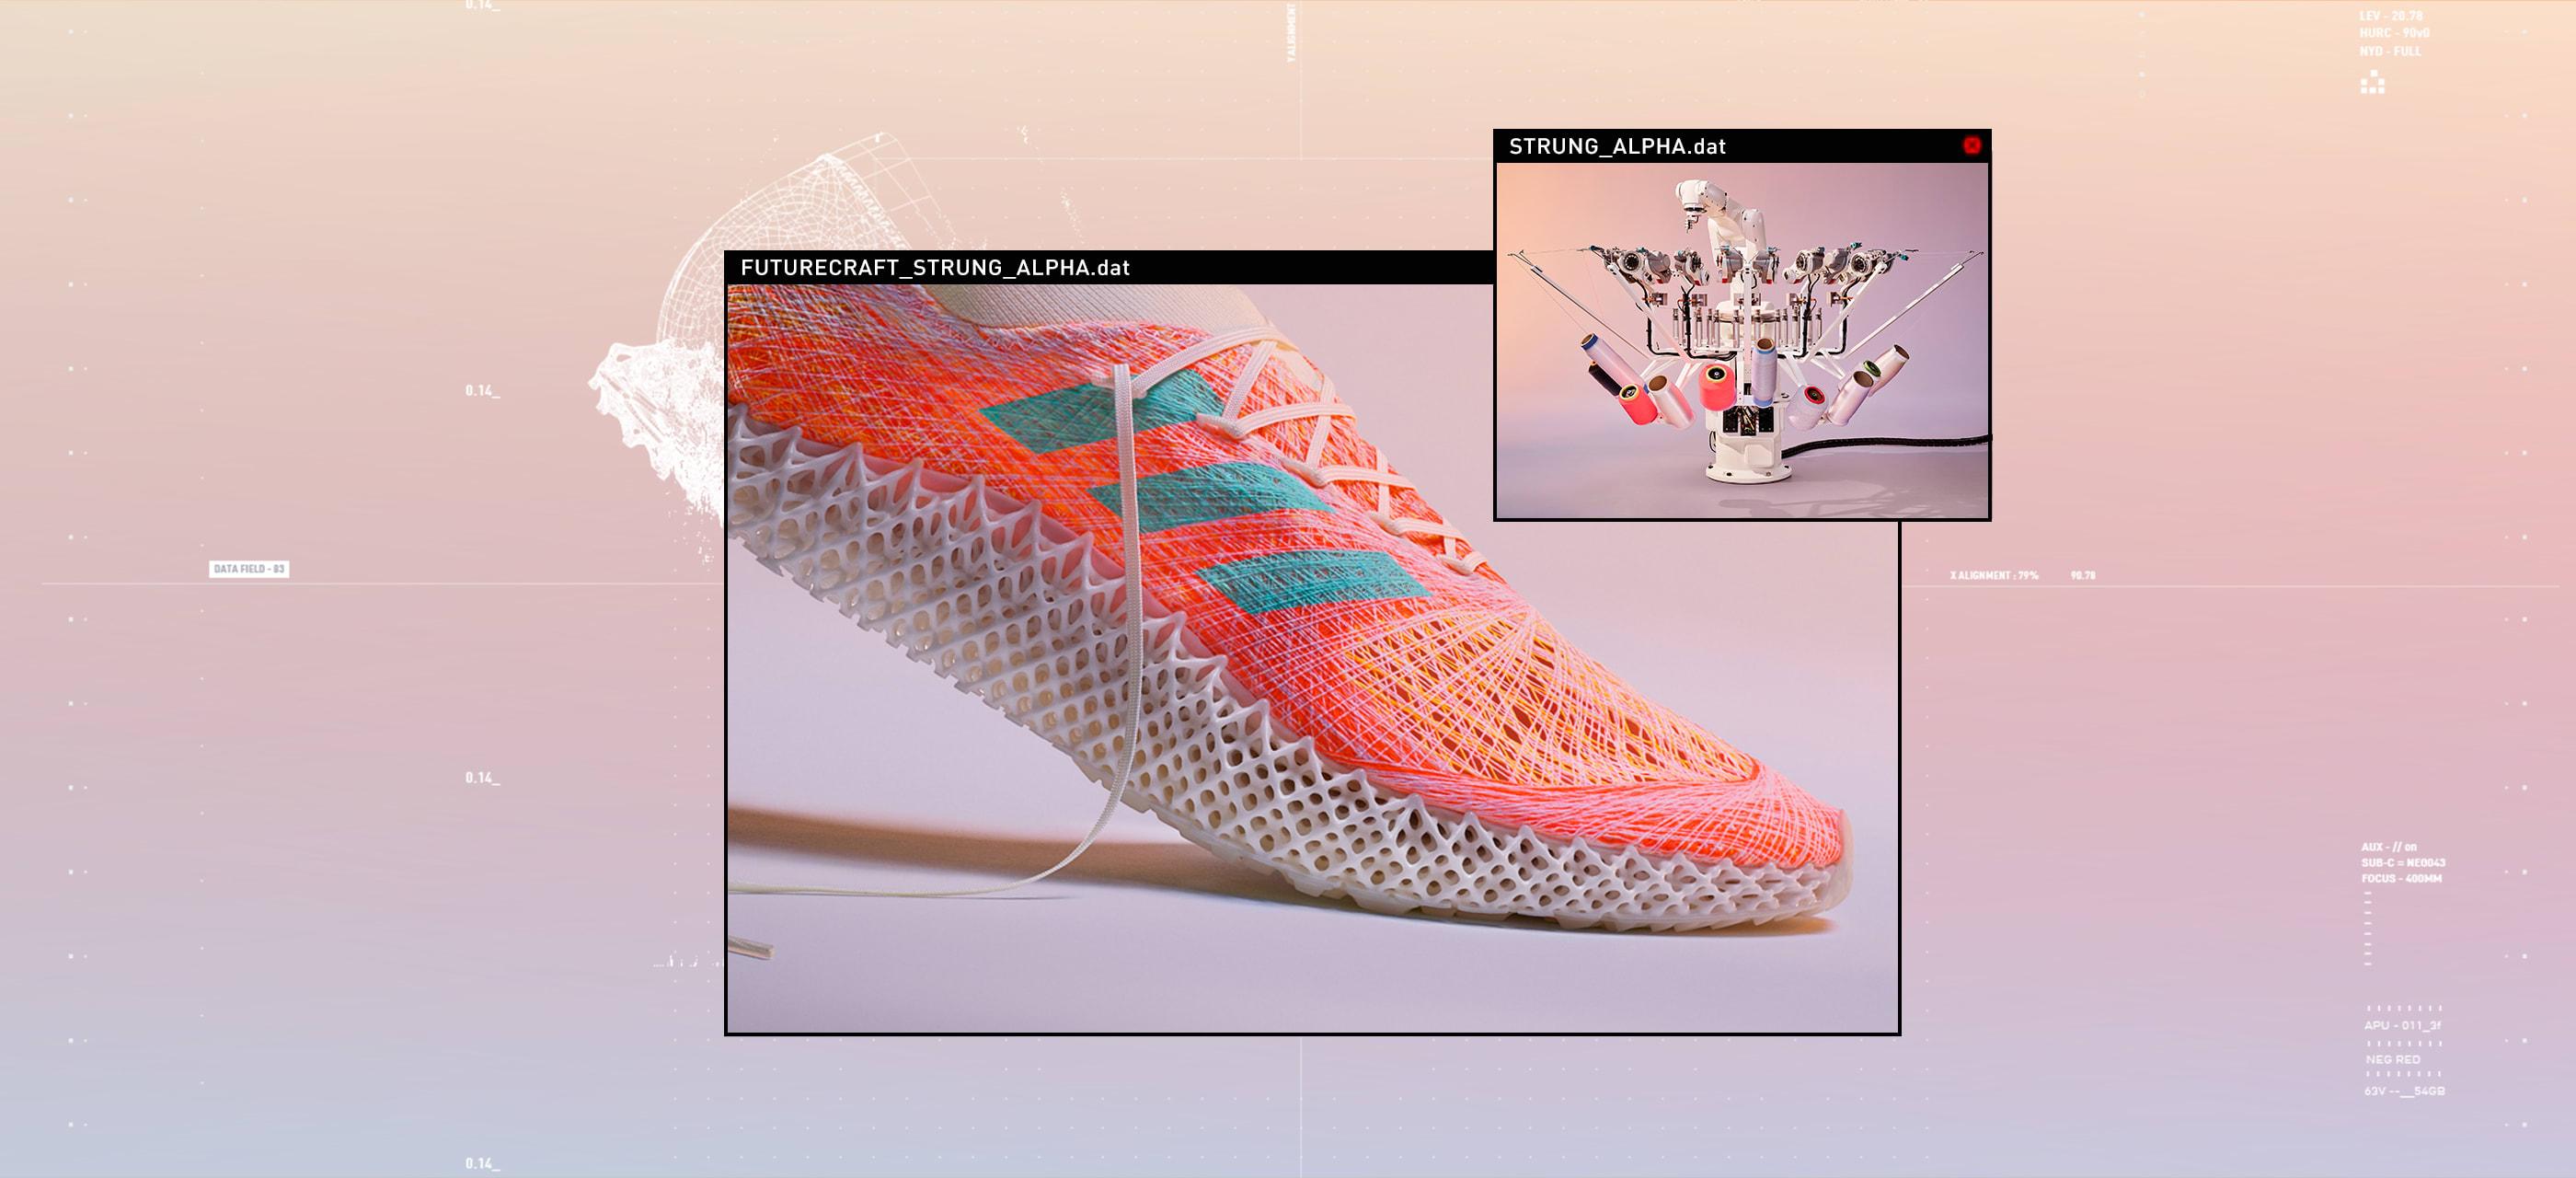 adidas ultra boost 3.0 sizing